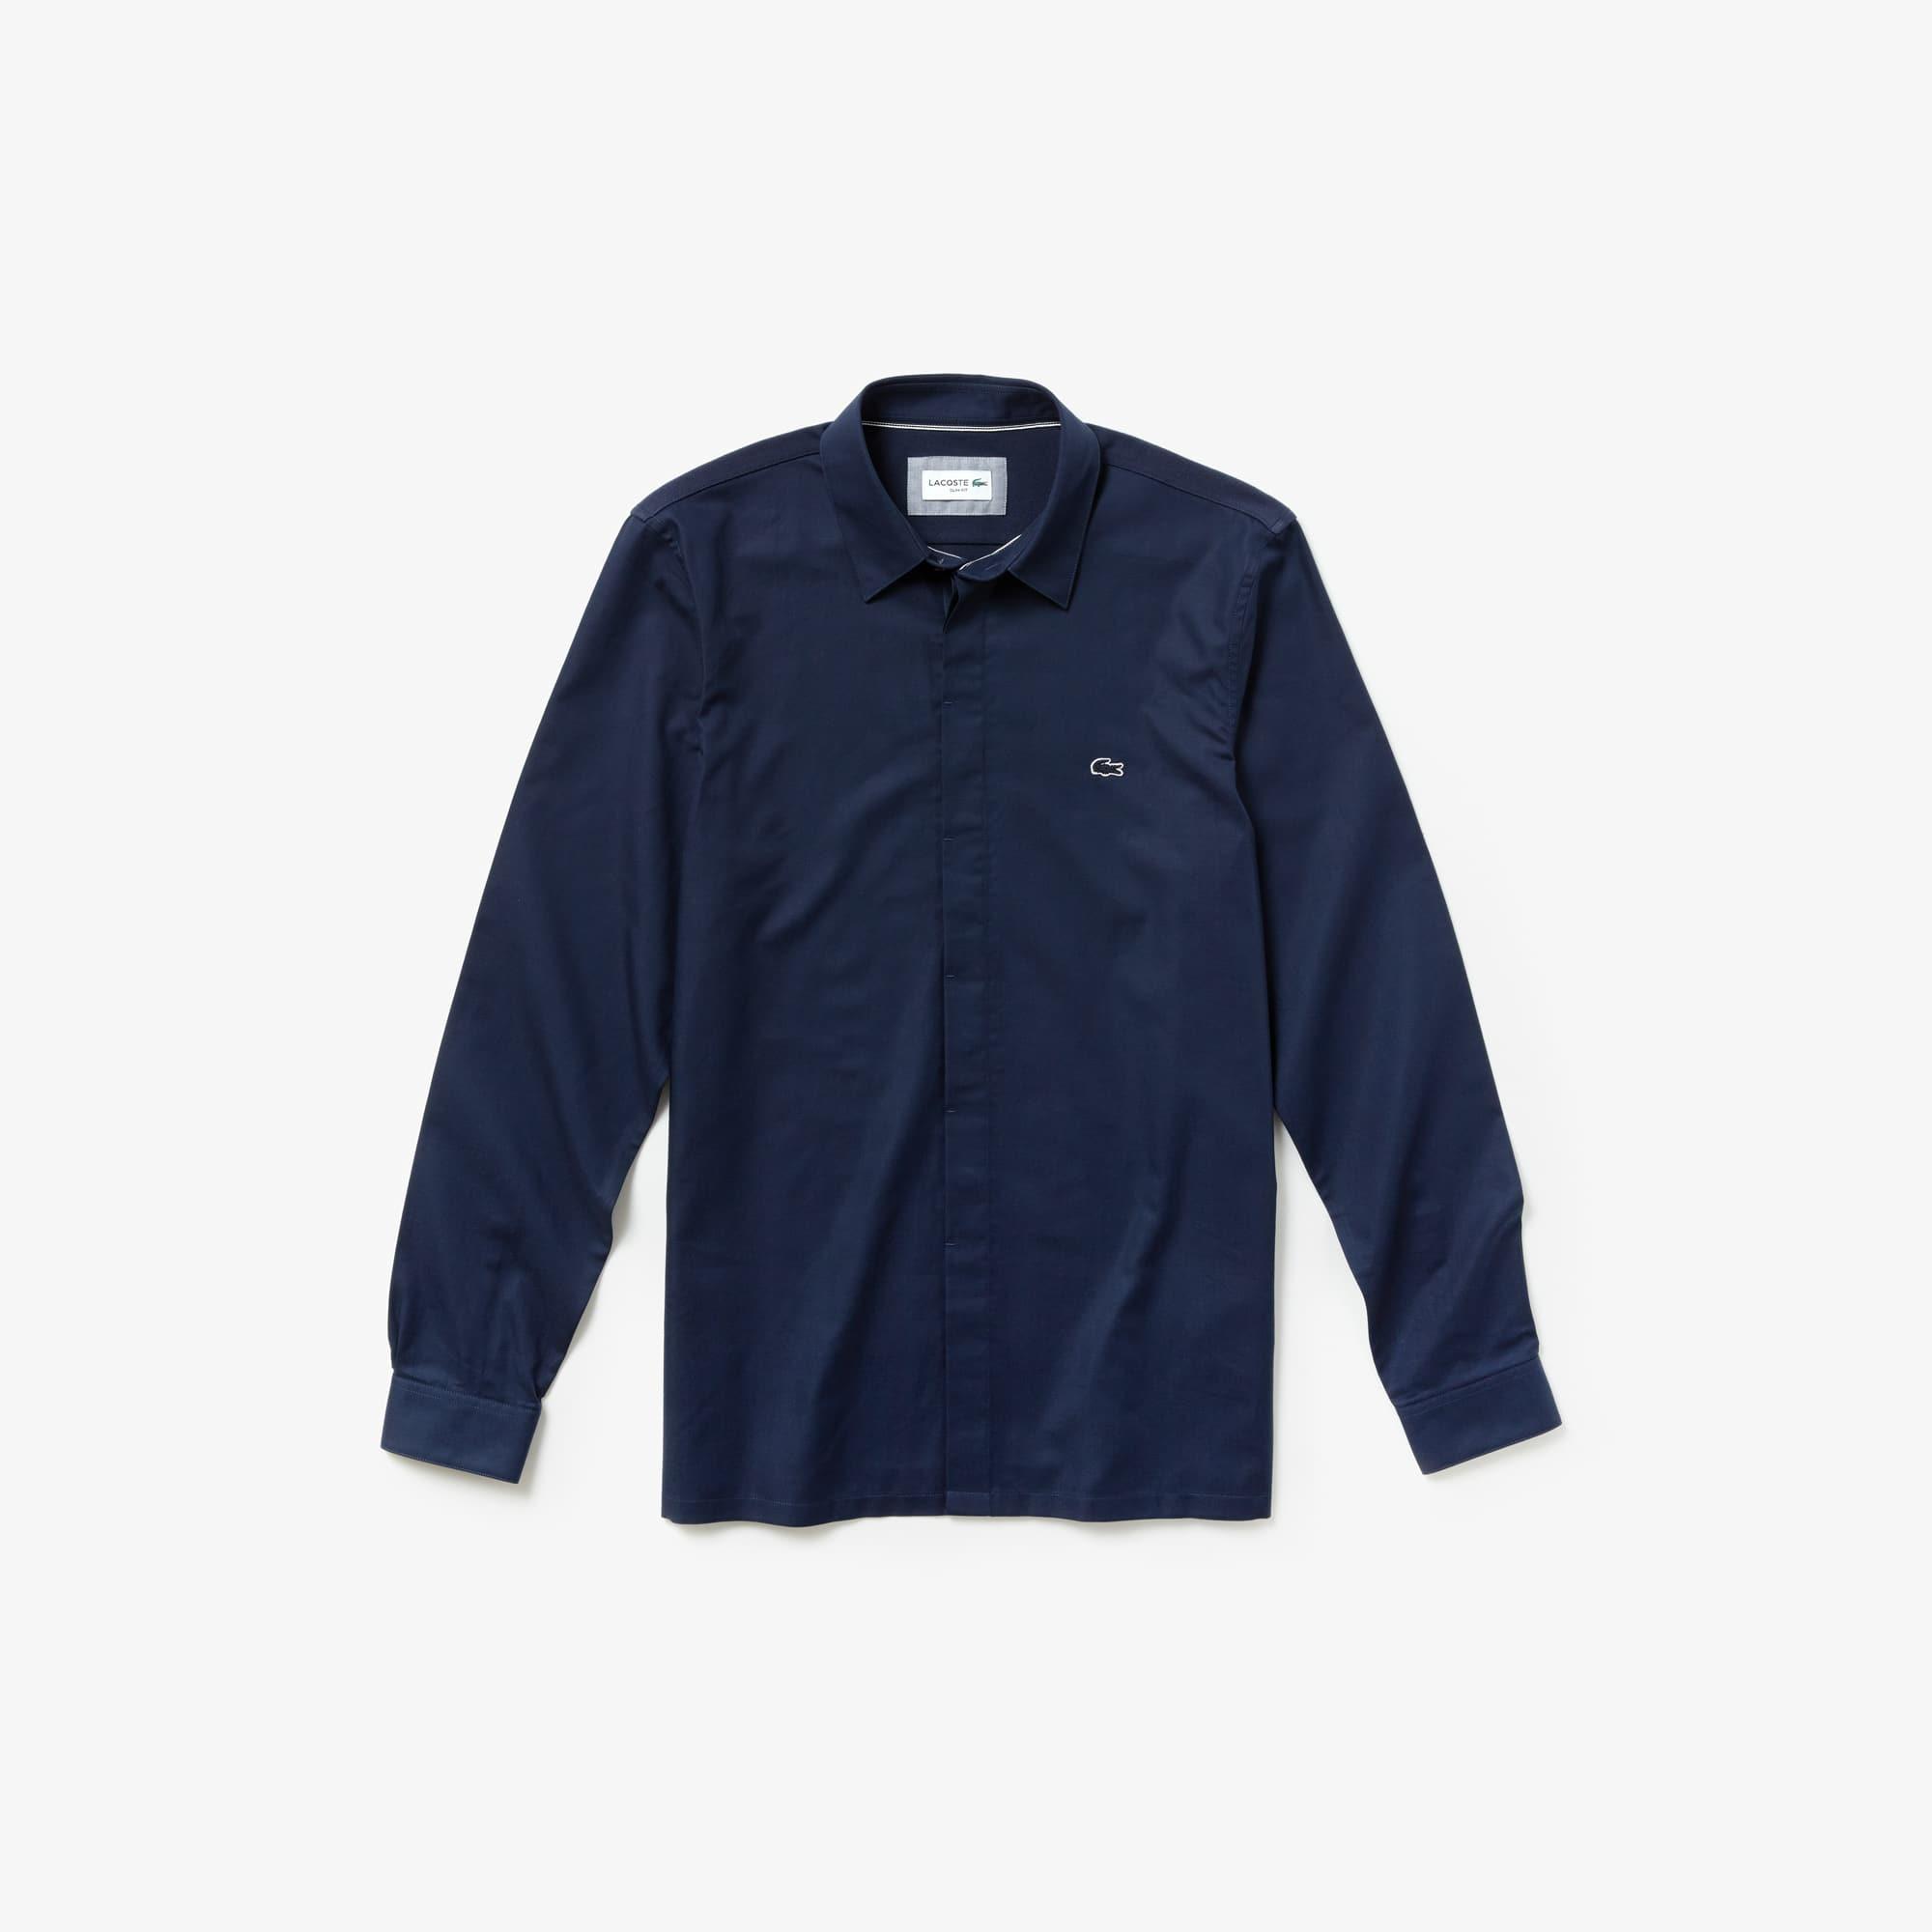 Lacoste Motion-shirt heren slim fit mini-katoenpiqué